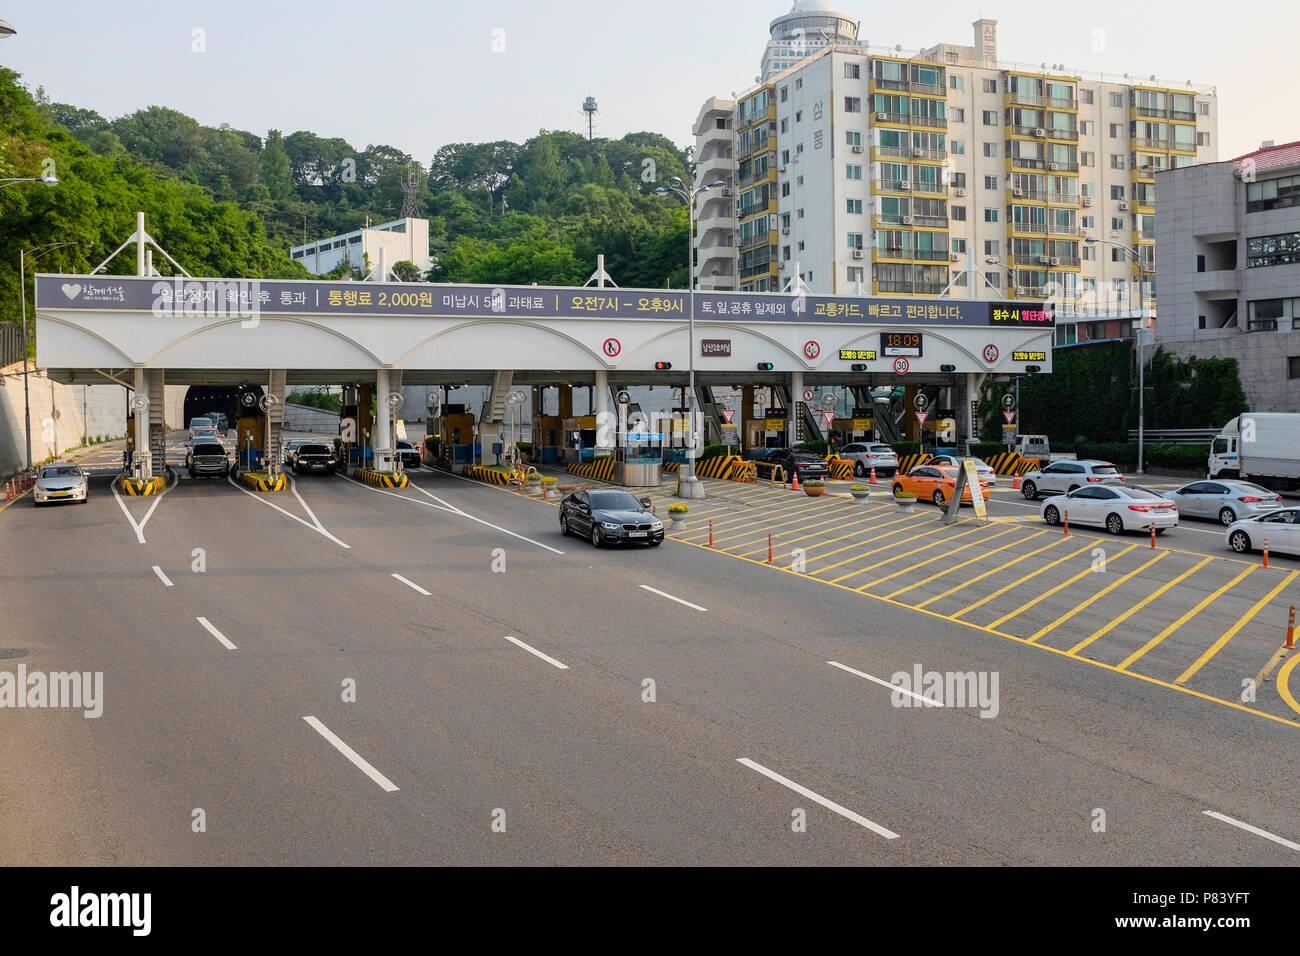 Namsan mountain tunnel toll booth, Seoul, South Korea. - Stock Image